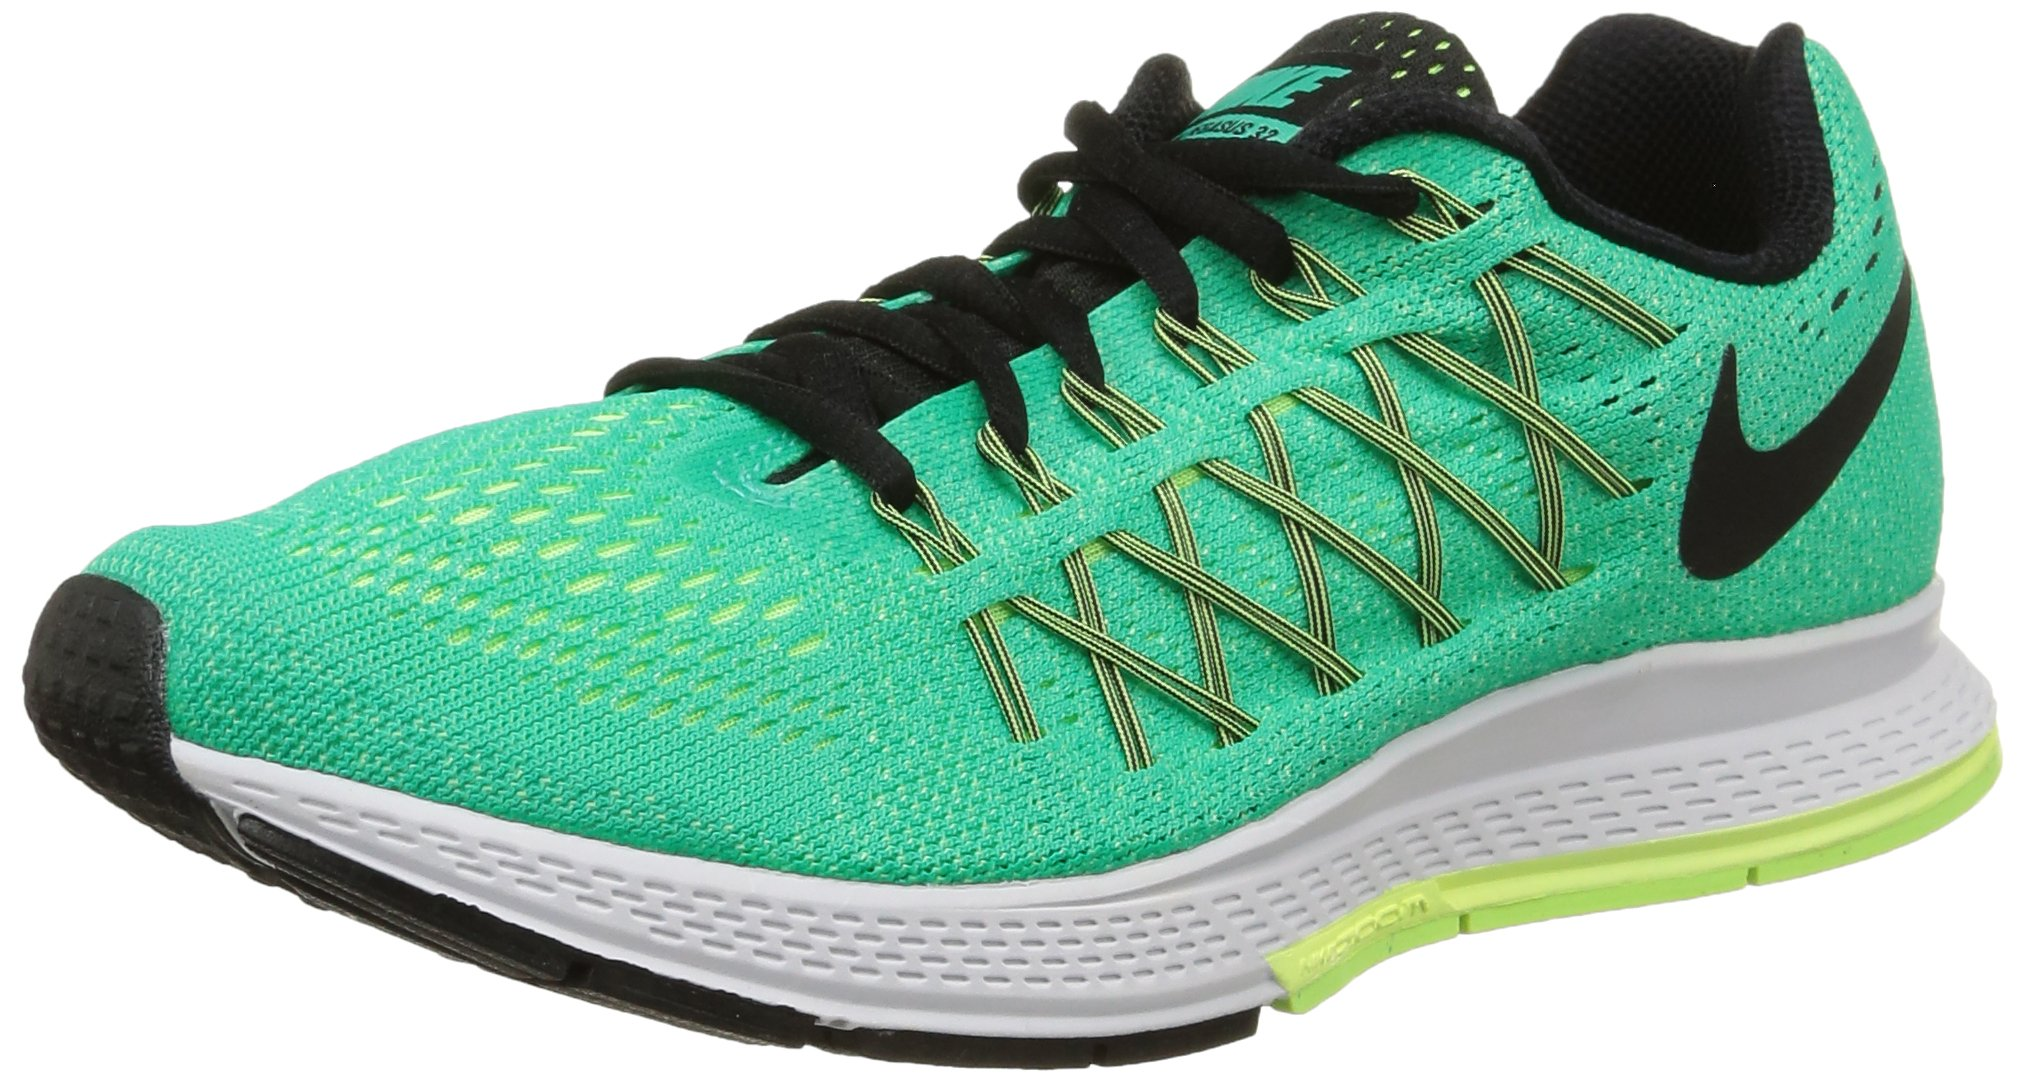 a903793b0105 Galleon - Nike Women s Air Zoom Pegasus 32 Menta Black Lqd Lime Ghst Grn  Running Shoe 8 Women US